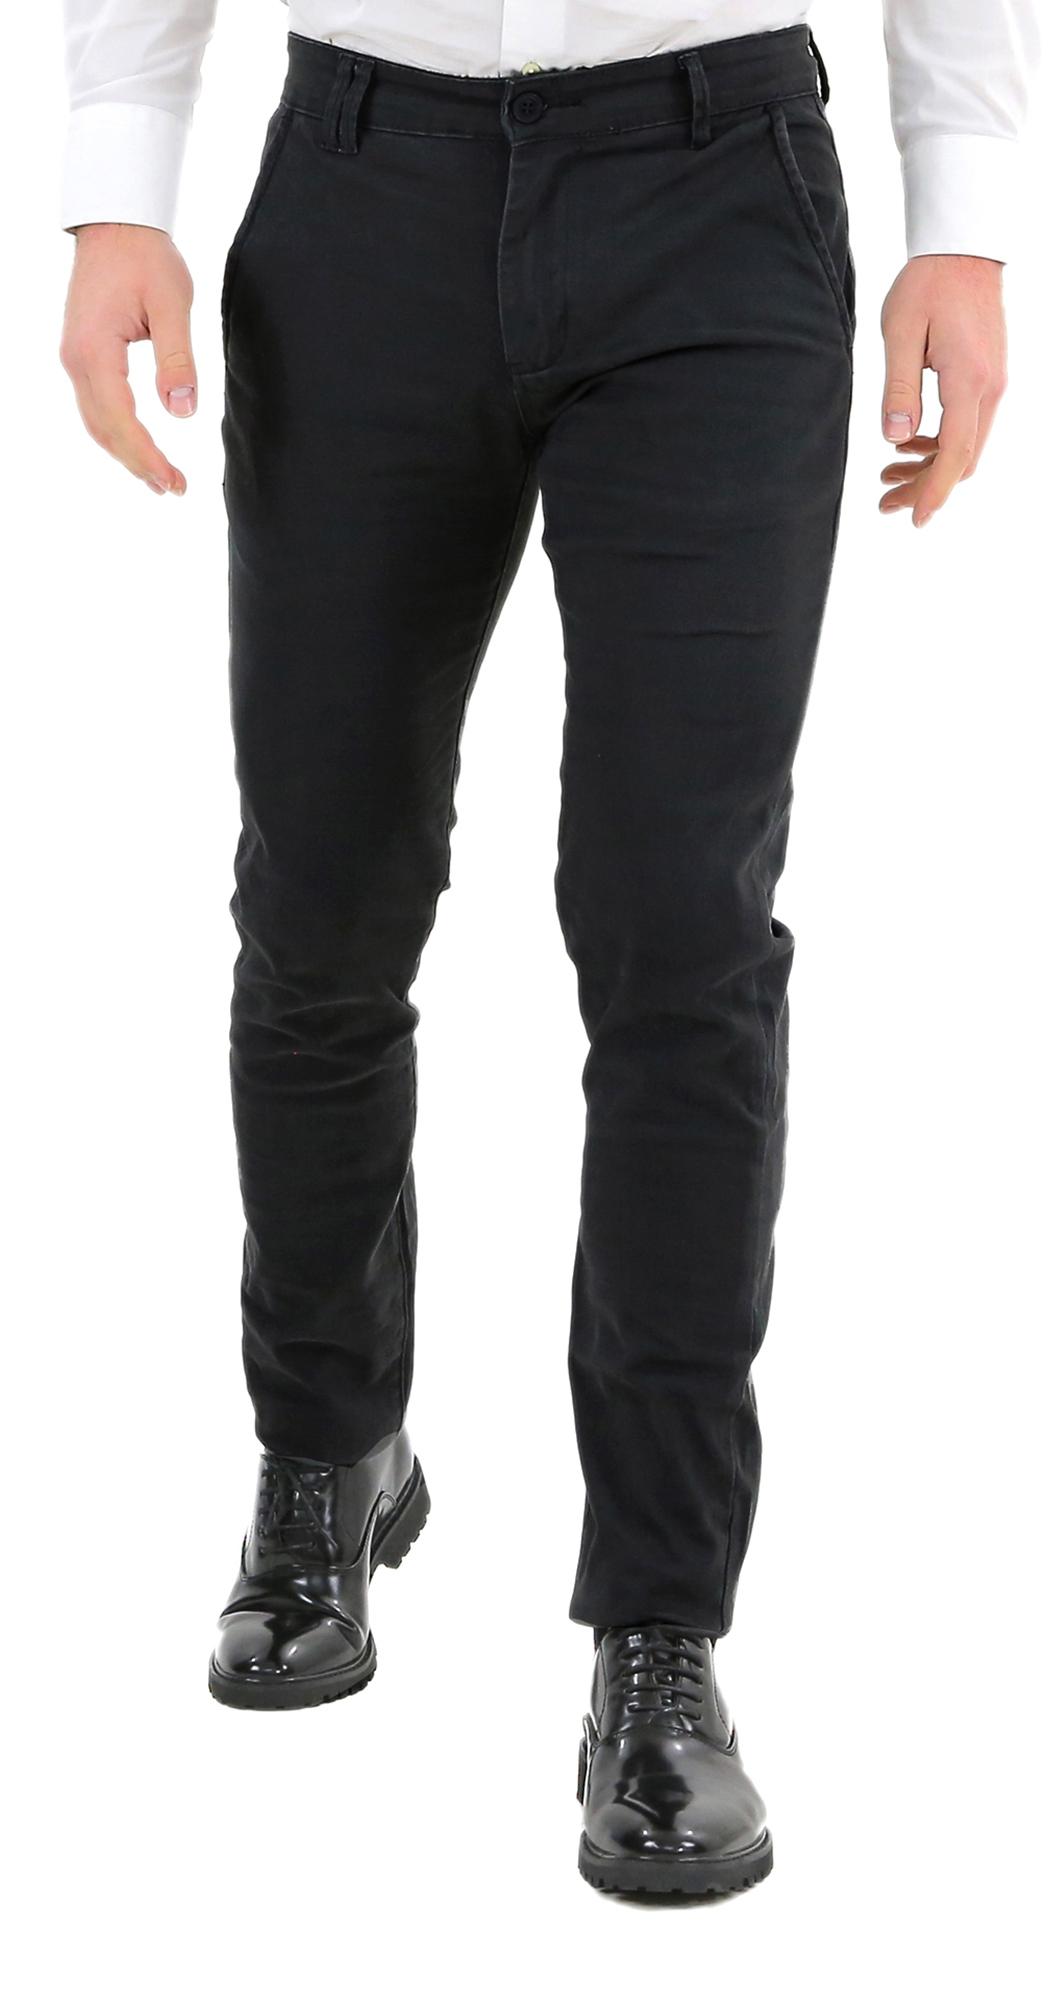 Pantaloni-Uomo-Slim-Fit-Eleganti-Invernali-Blu-Nero-Classico-Chino-Tasca-America miniatura 11